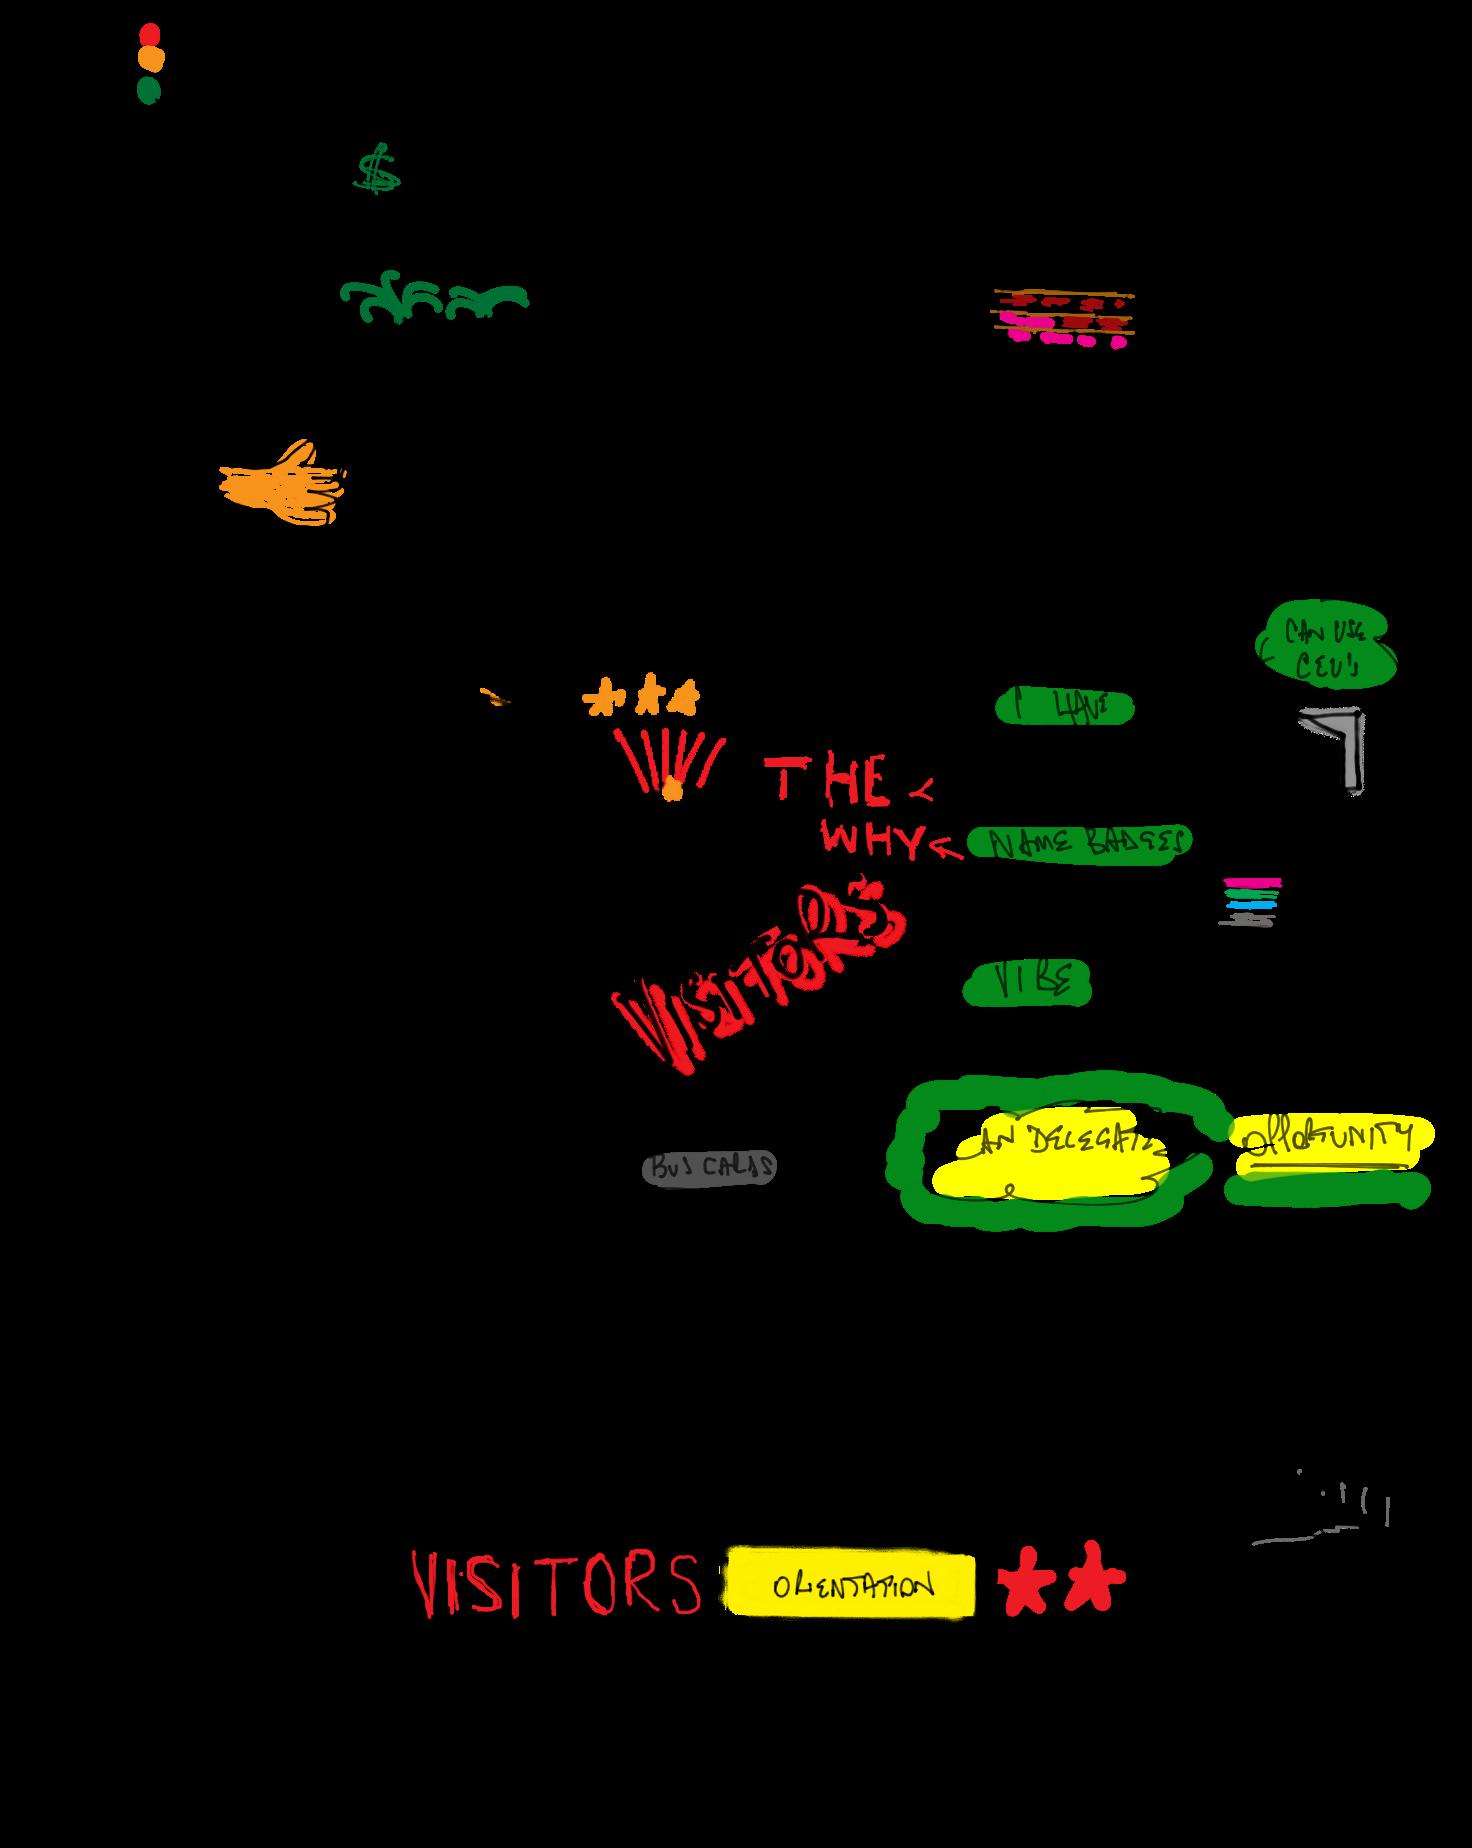 Sketchnote Army A Showcase Of Sketchnotes Sketch Notes Sketchnotes Mind Map